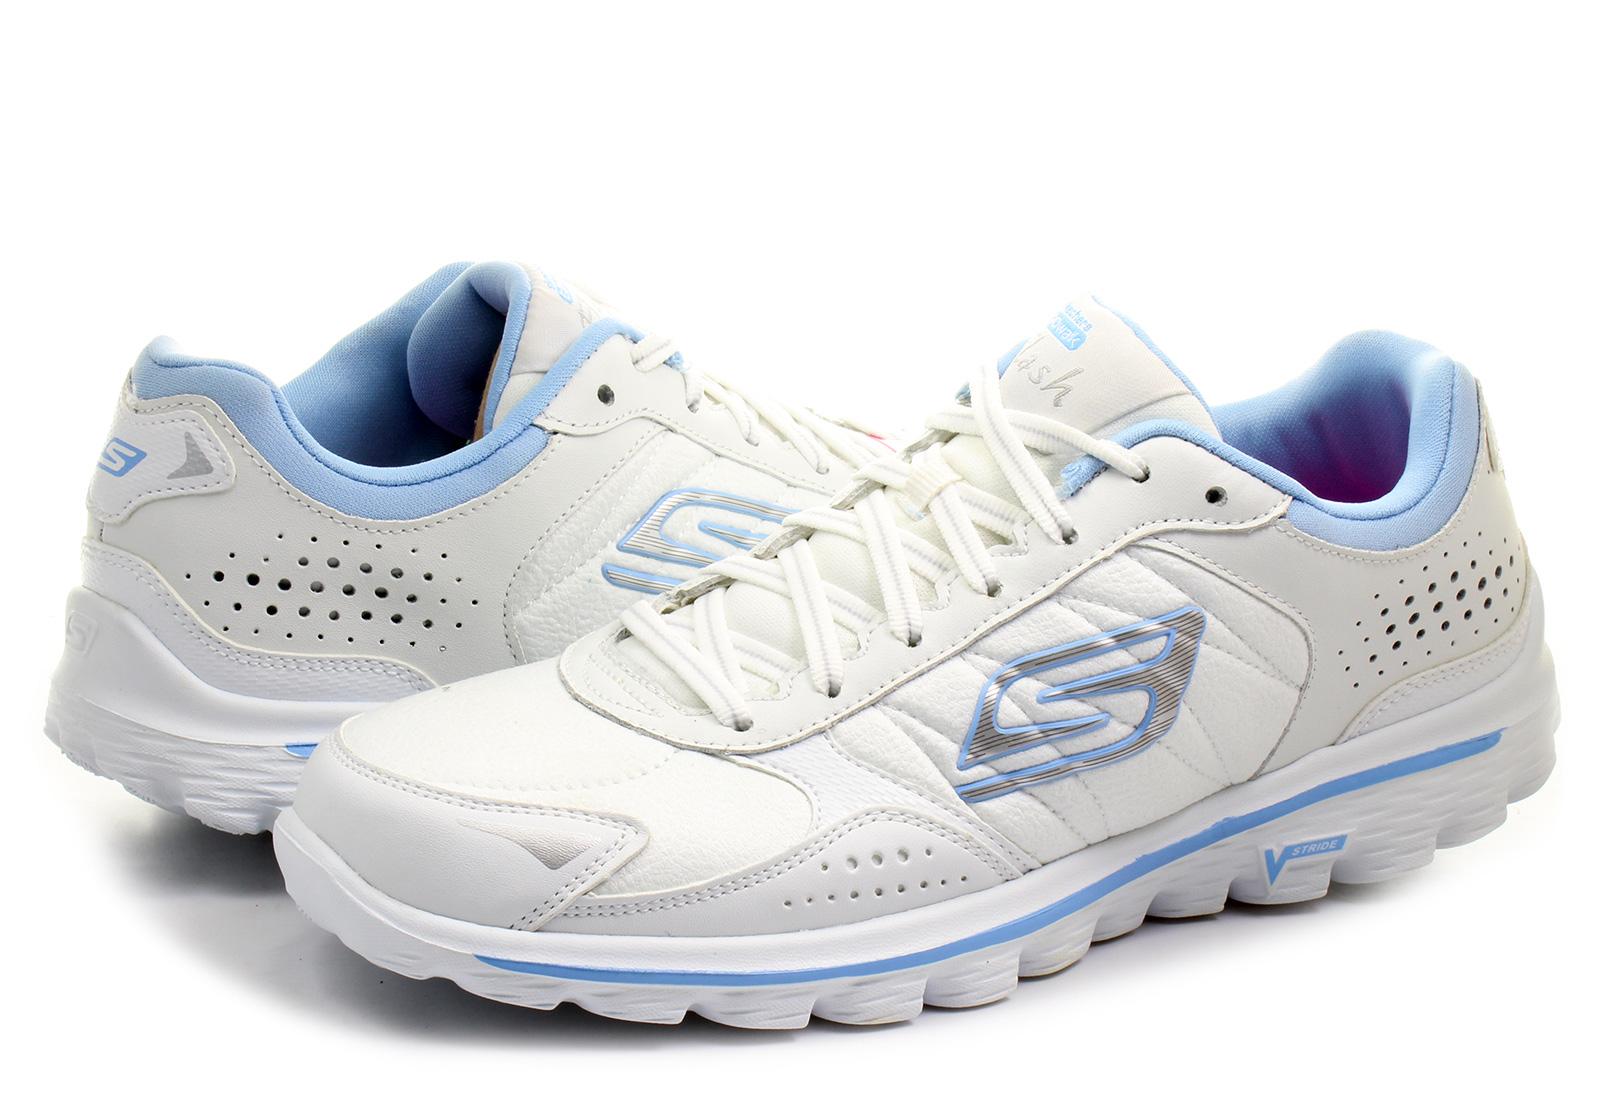 5272031a1461 Skechers Shoes - Go Walk 2 - Flash Lt - 13973-WLBL - Online shop ...